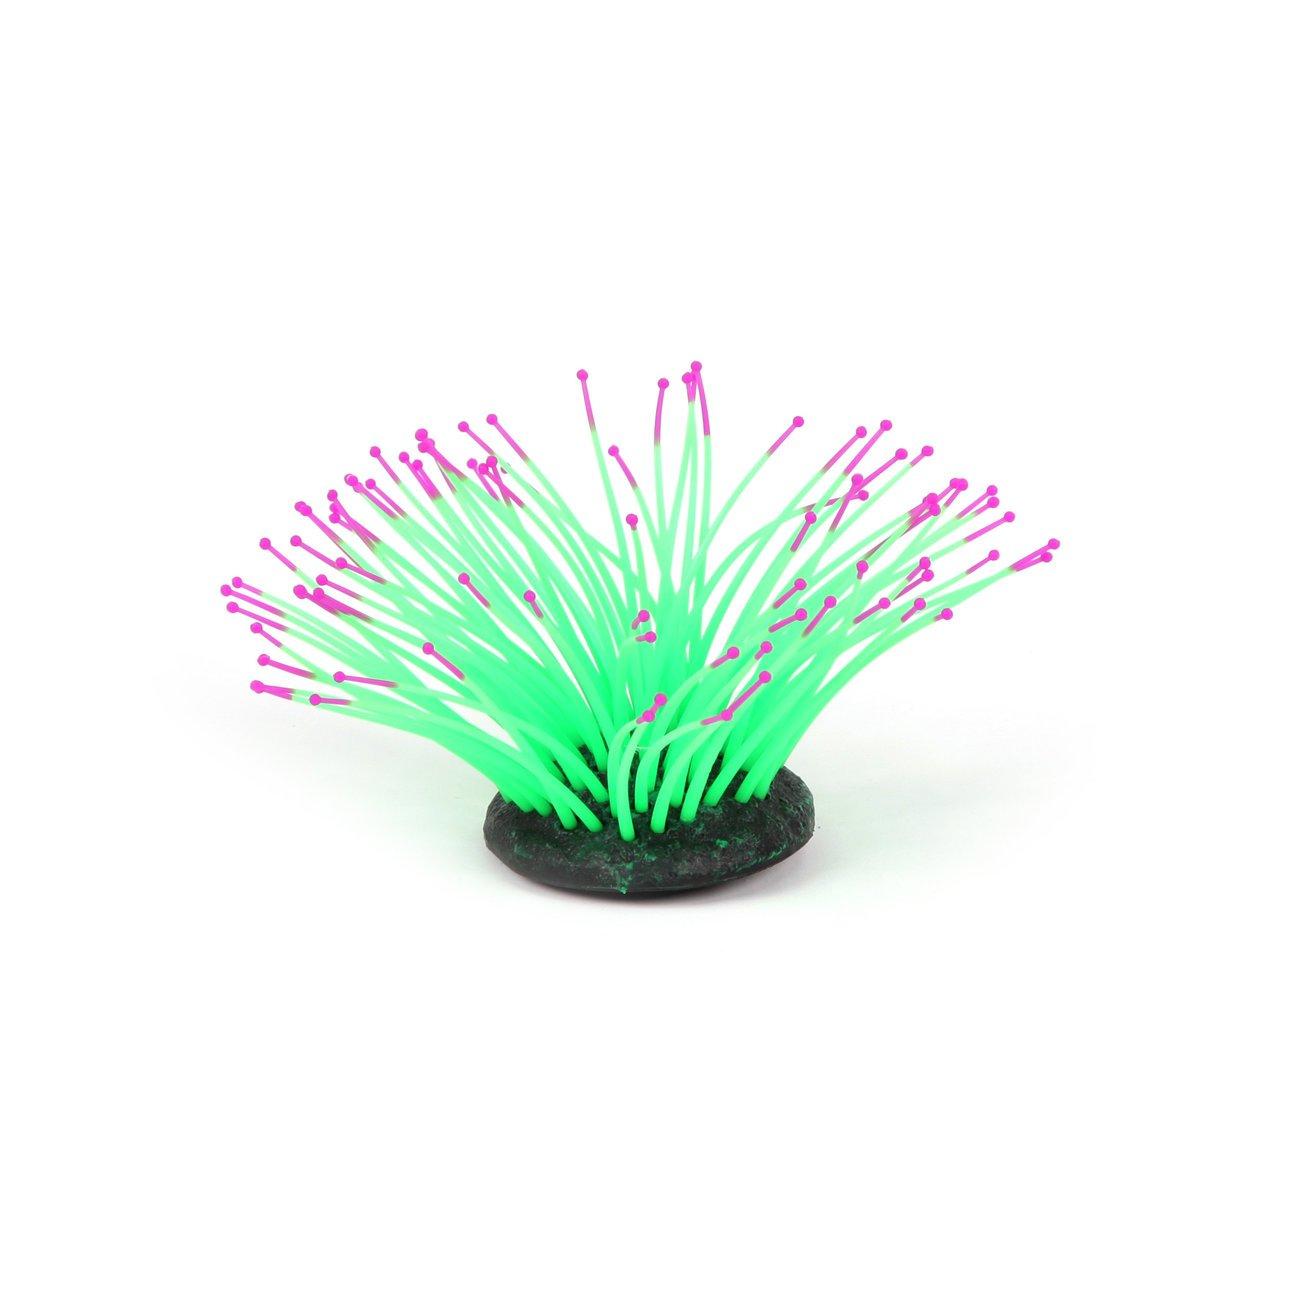 Aquatlantis Aqua Glow Anemone, Bild 7